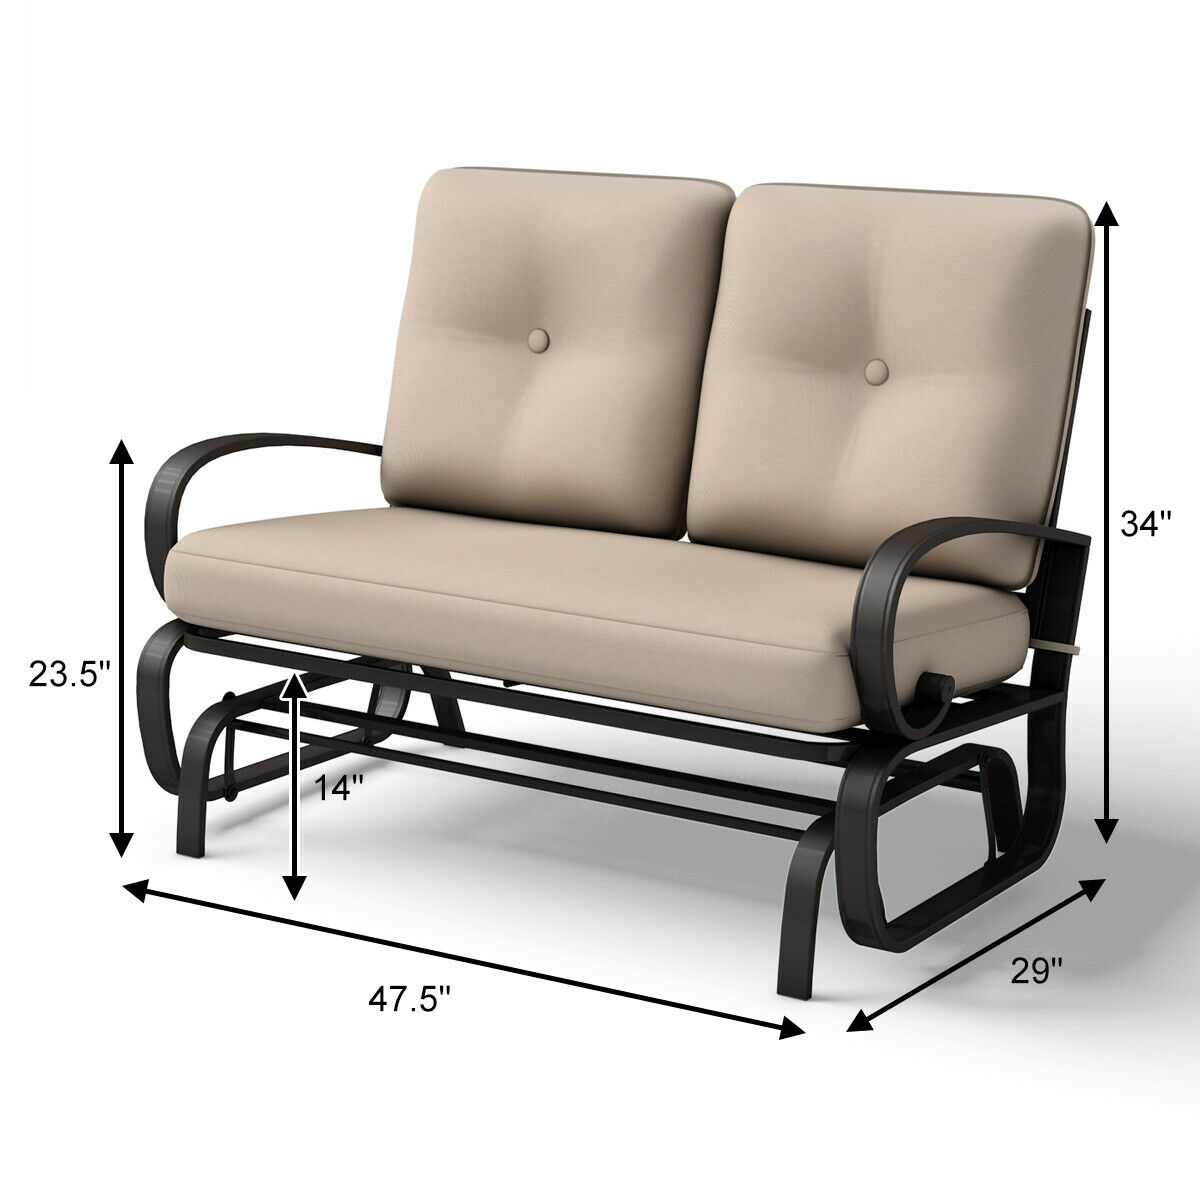 Costway Glider Outdoor Patio Rocking Bench Loveseat Regarding Black Outdoor Durable Steel Frame Patio Swing Glider Bench Chairs (Photo 13 of 25)